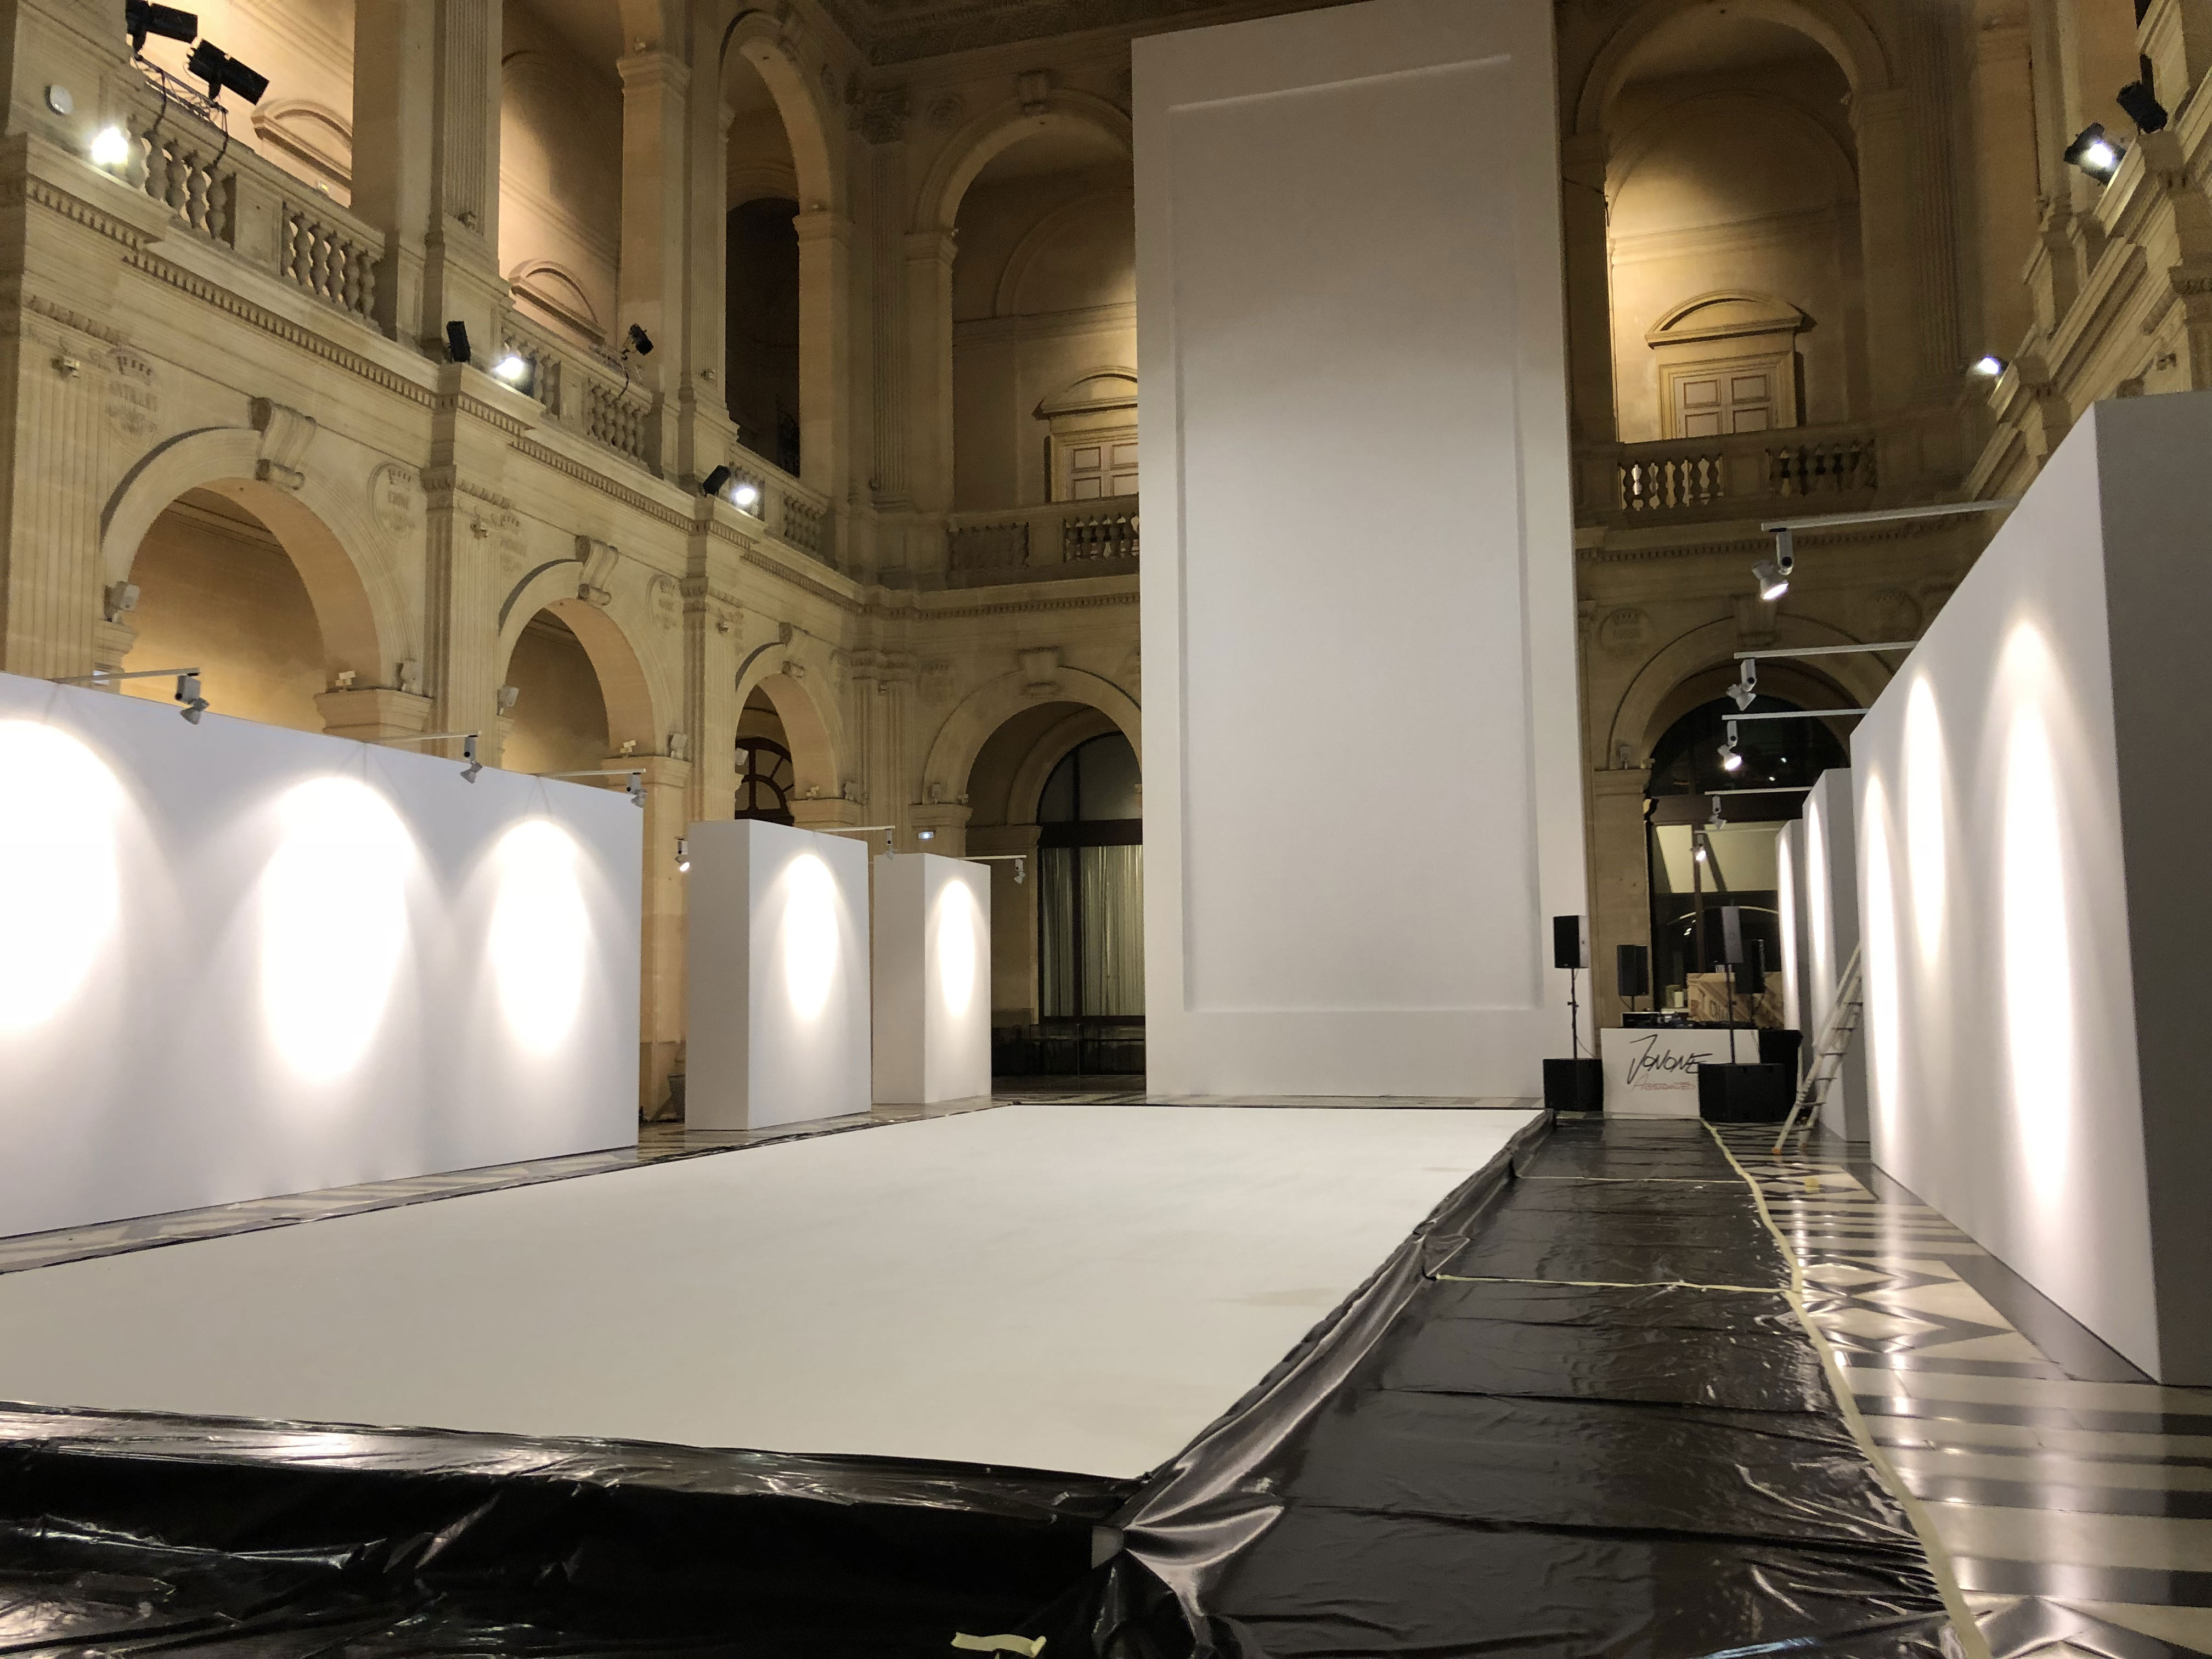 toiles-expo-marseille-palaisdelabourse-peinture-aucop-audiovisuel-oeuvres-performance-live-painting-jonone-david-pluskwa-galerie-contemporain-art